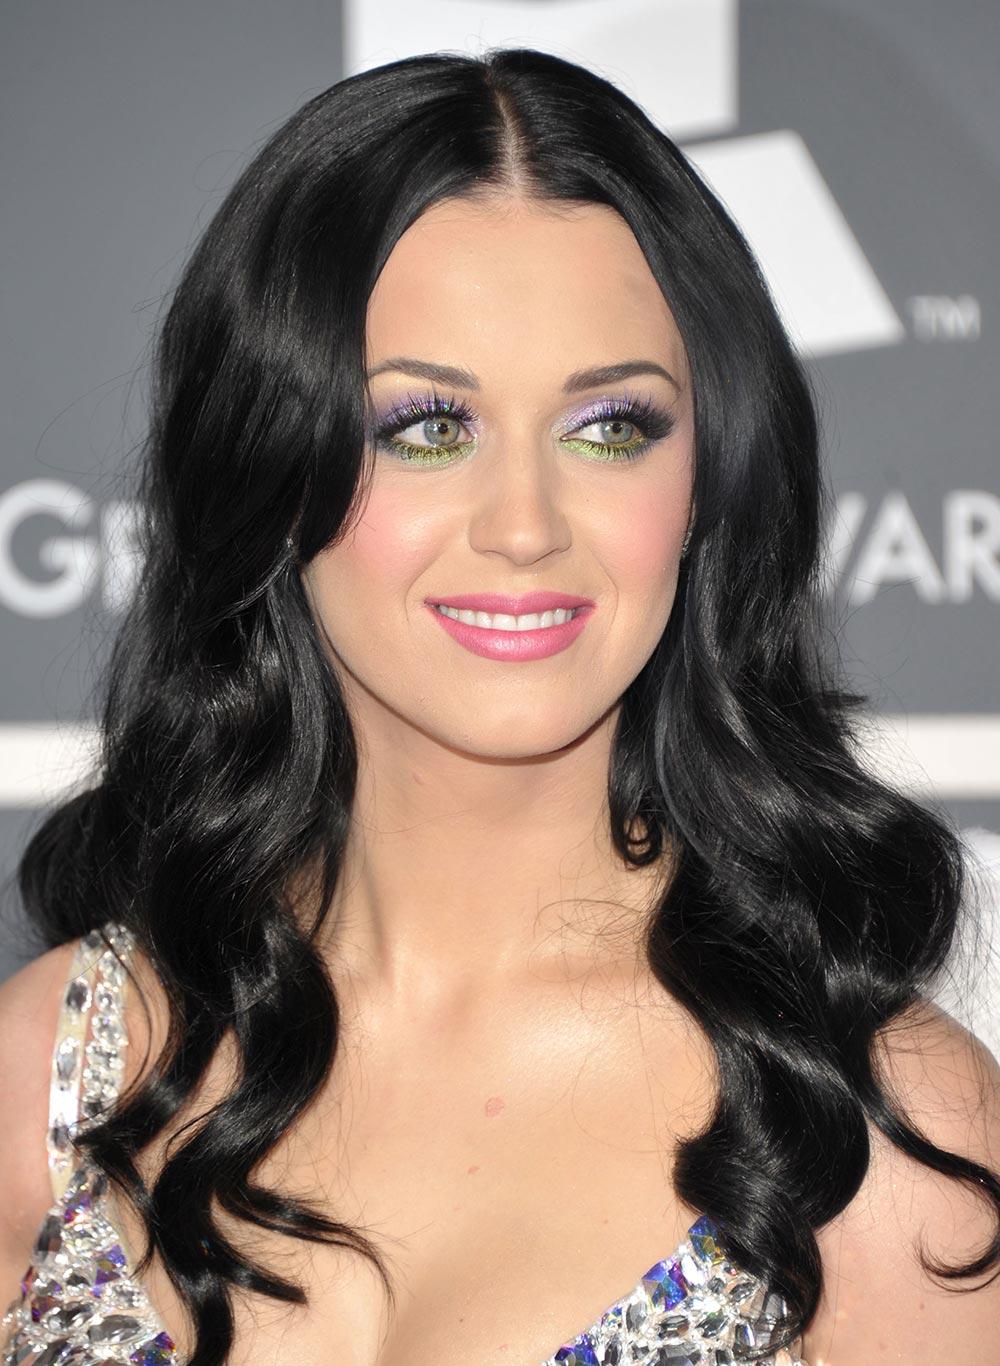 Celebrity makeup breakdown